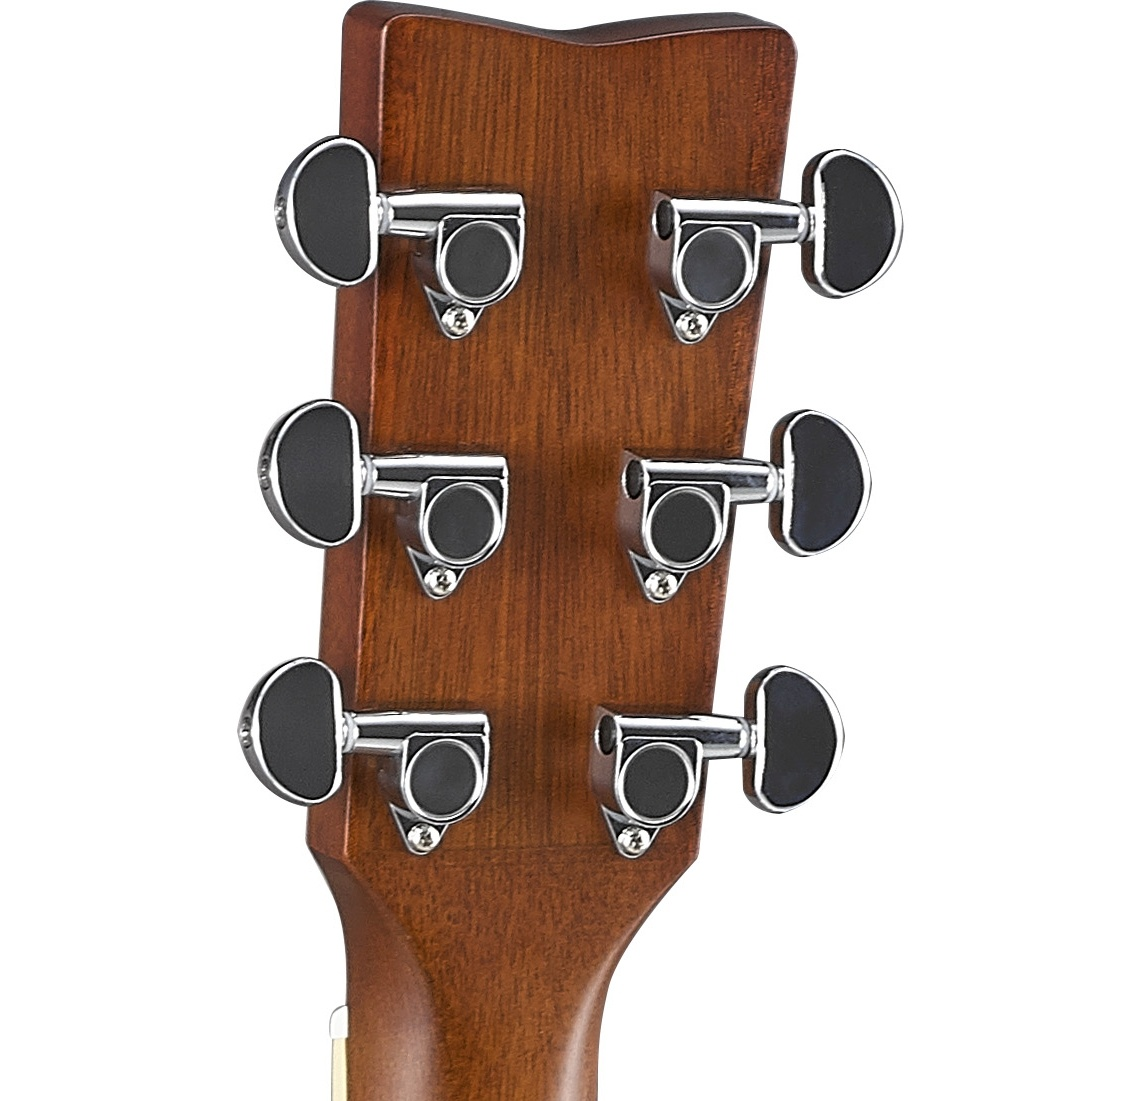 Loyal Yamaha Trans Acoustic Guitar Fg-ta Black Bl From Japan Musical Instruments & Gear Guitars & Basses